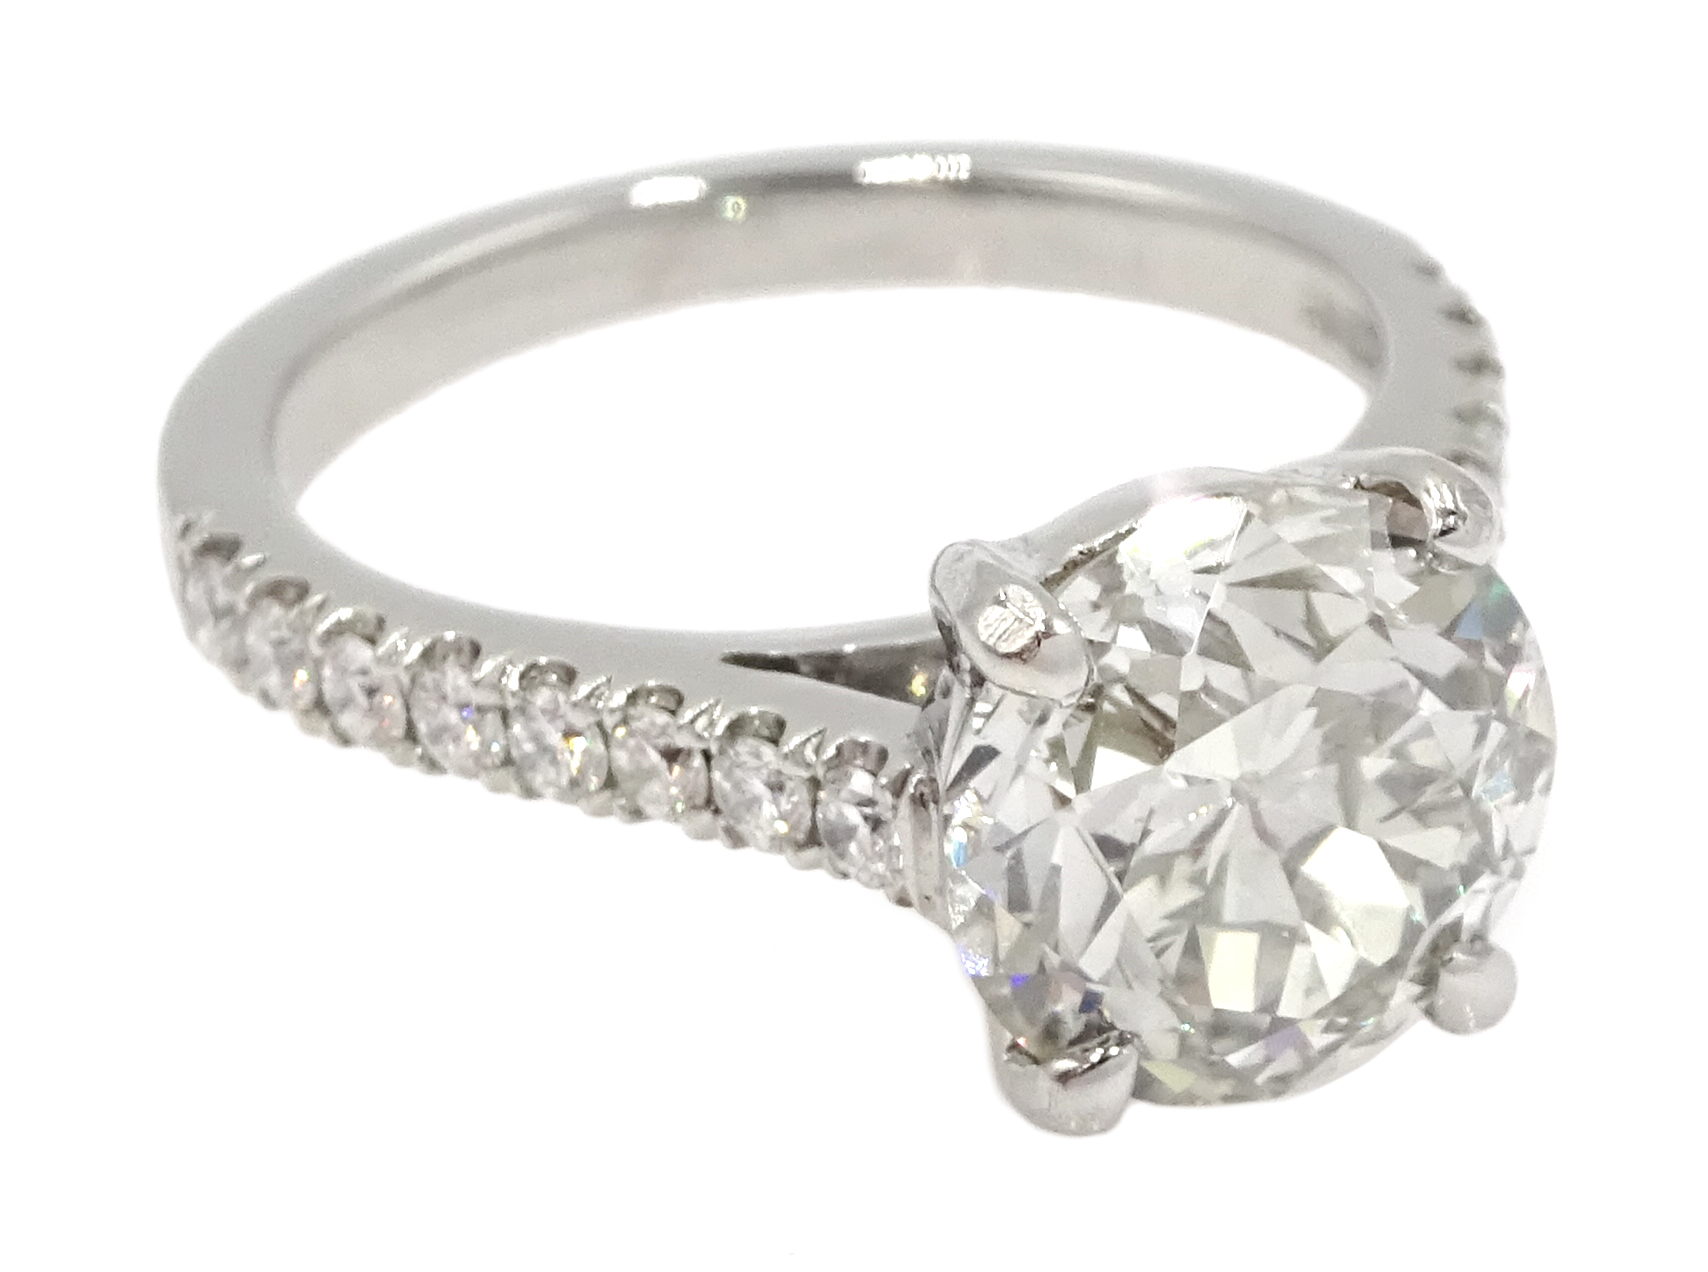 Platinum old cut diamond solitaire ring - Image 3 of 9